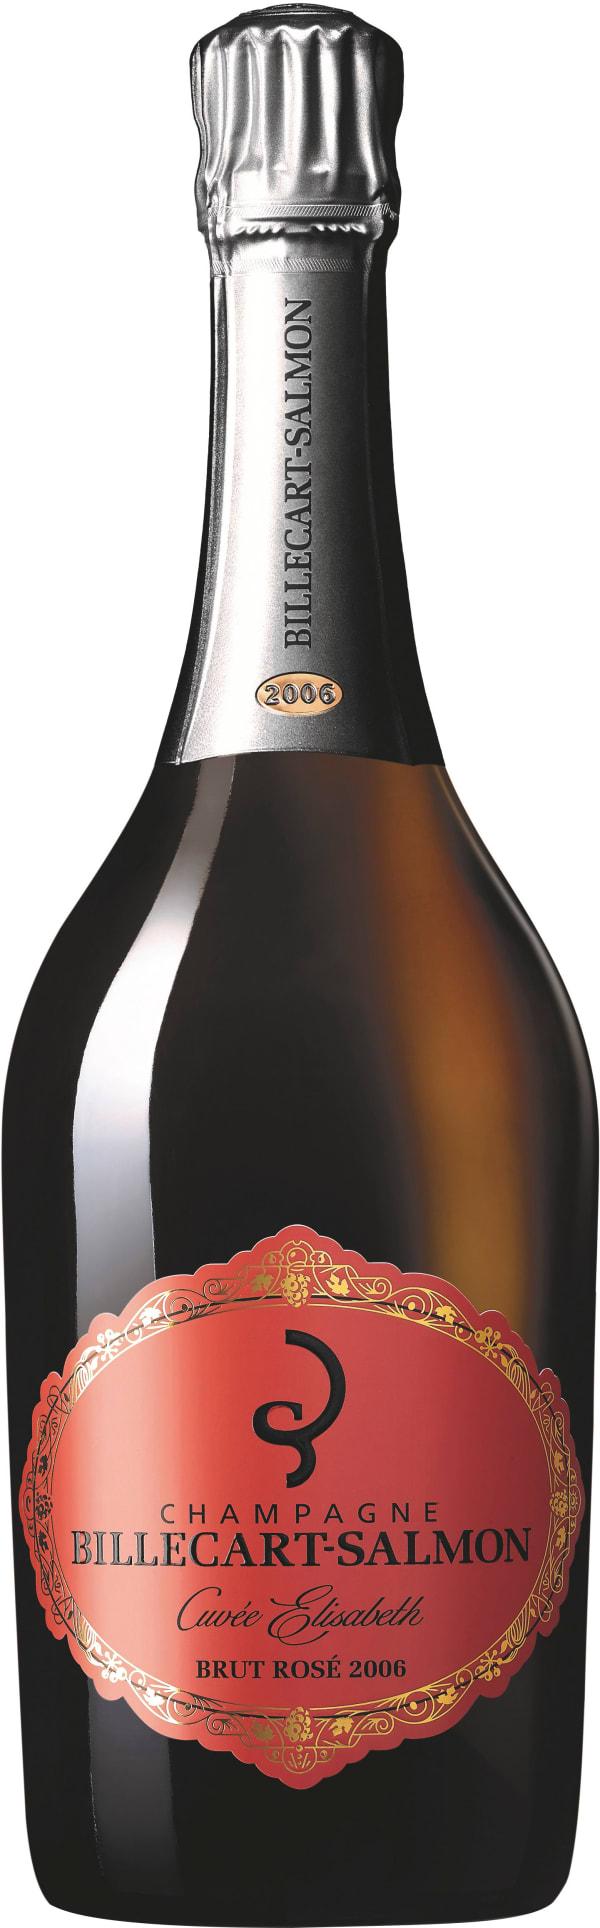 Billecart-Salmon Cuvée Elisabeth Rosé Champagne Brut 2006